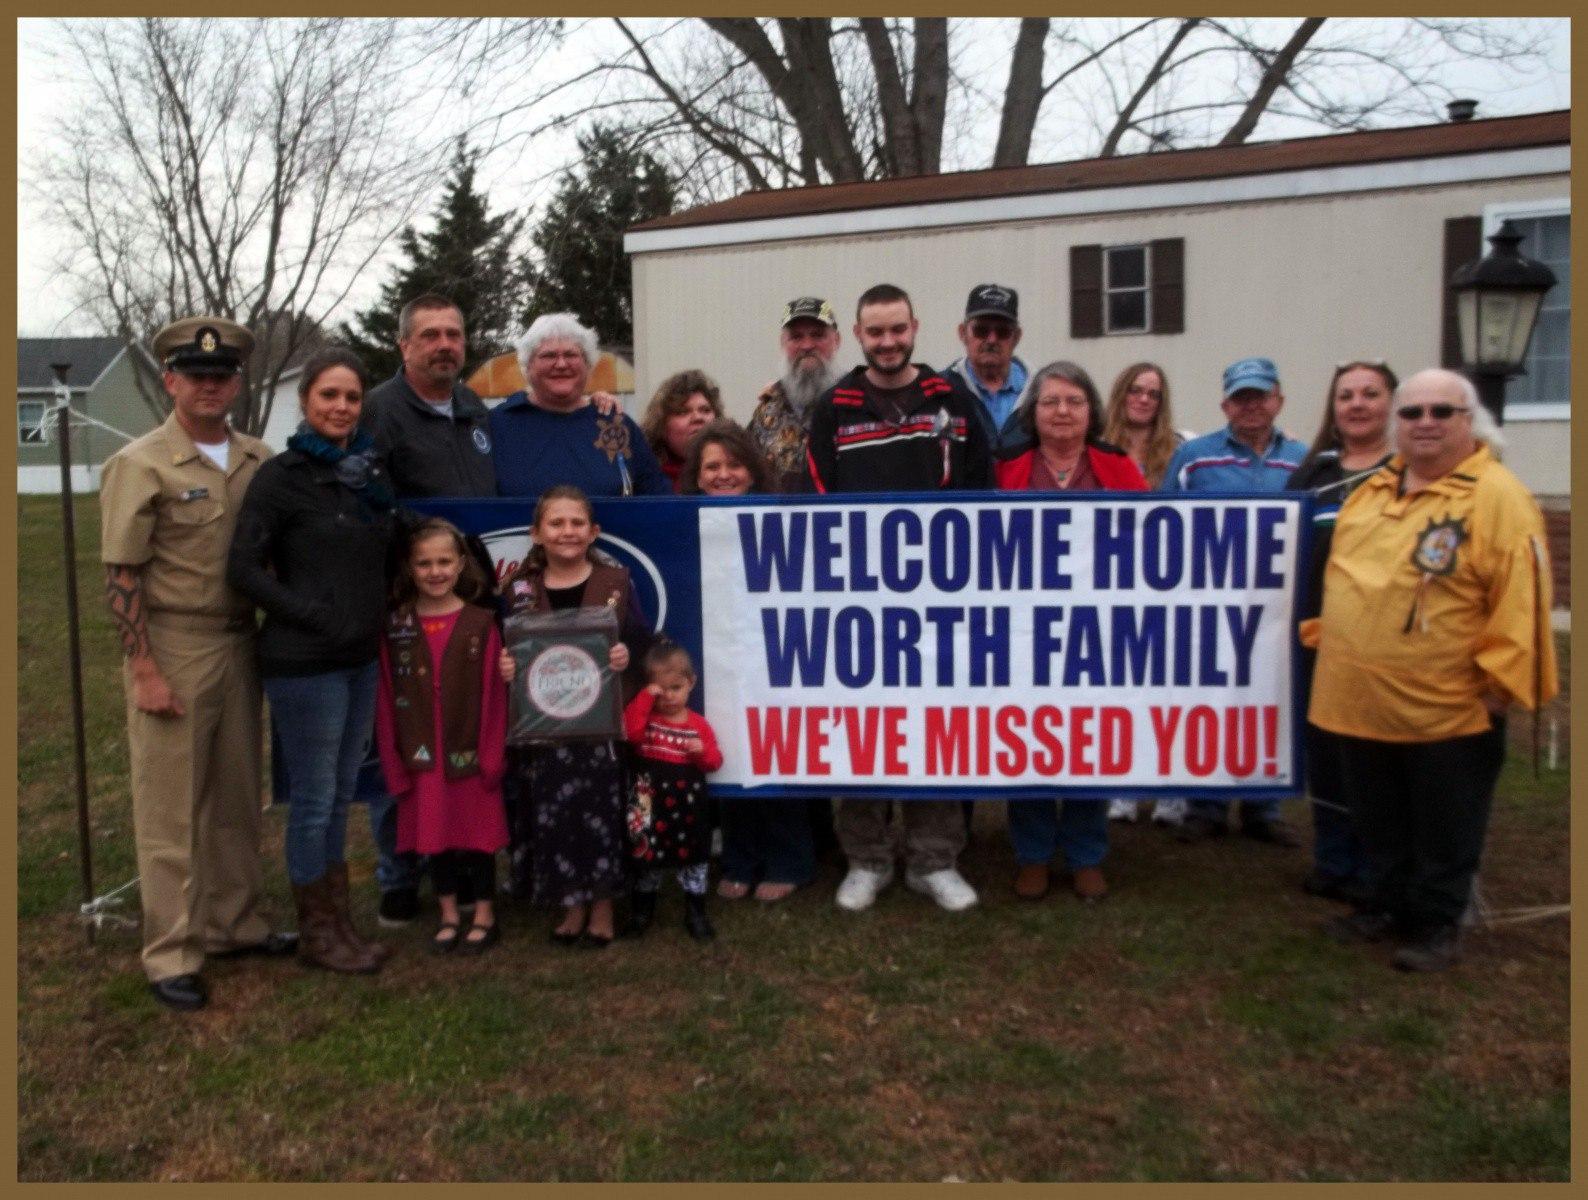 Nause-Waiwash Welcome Home the Worth Family